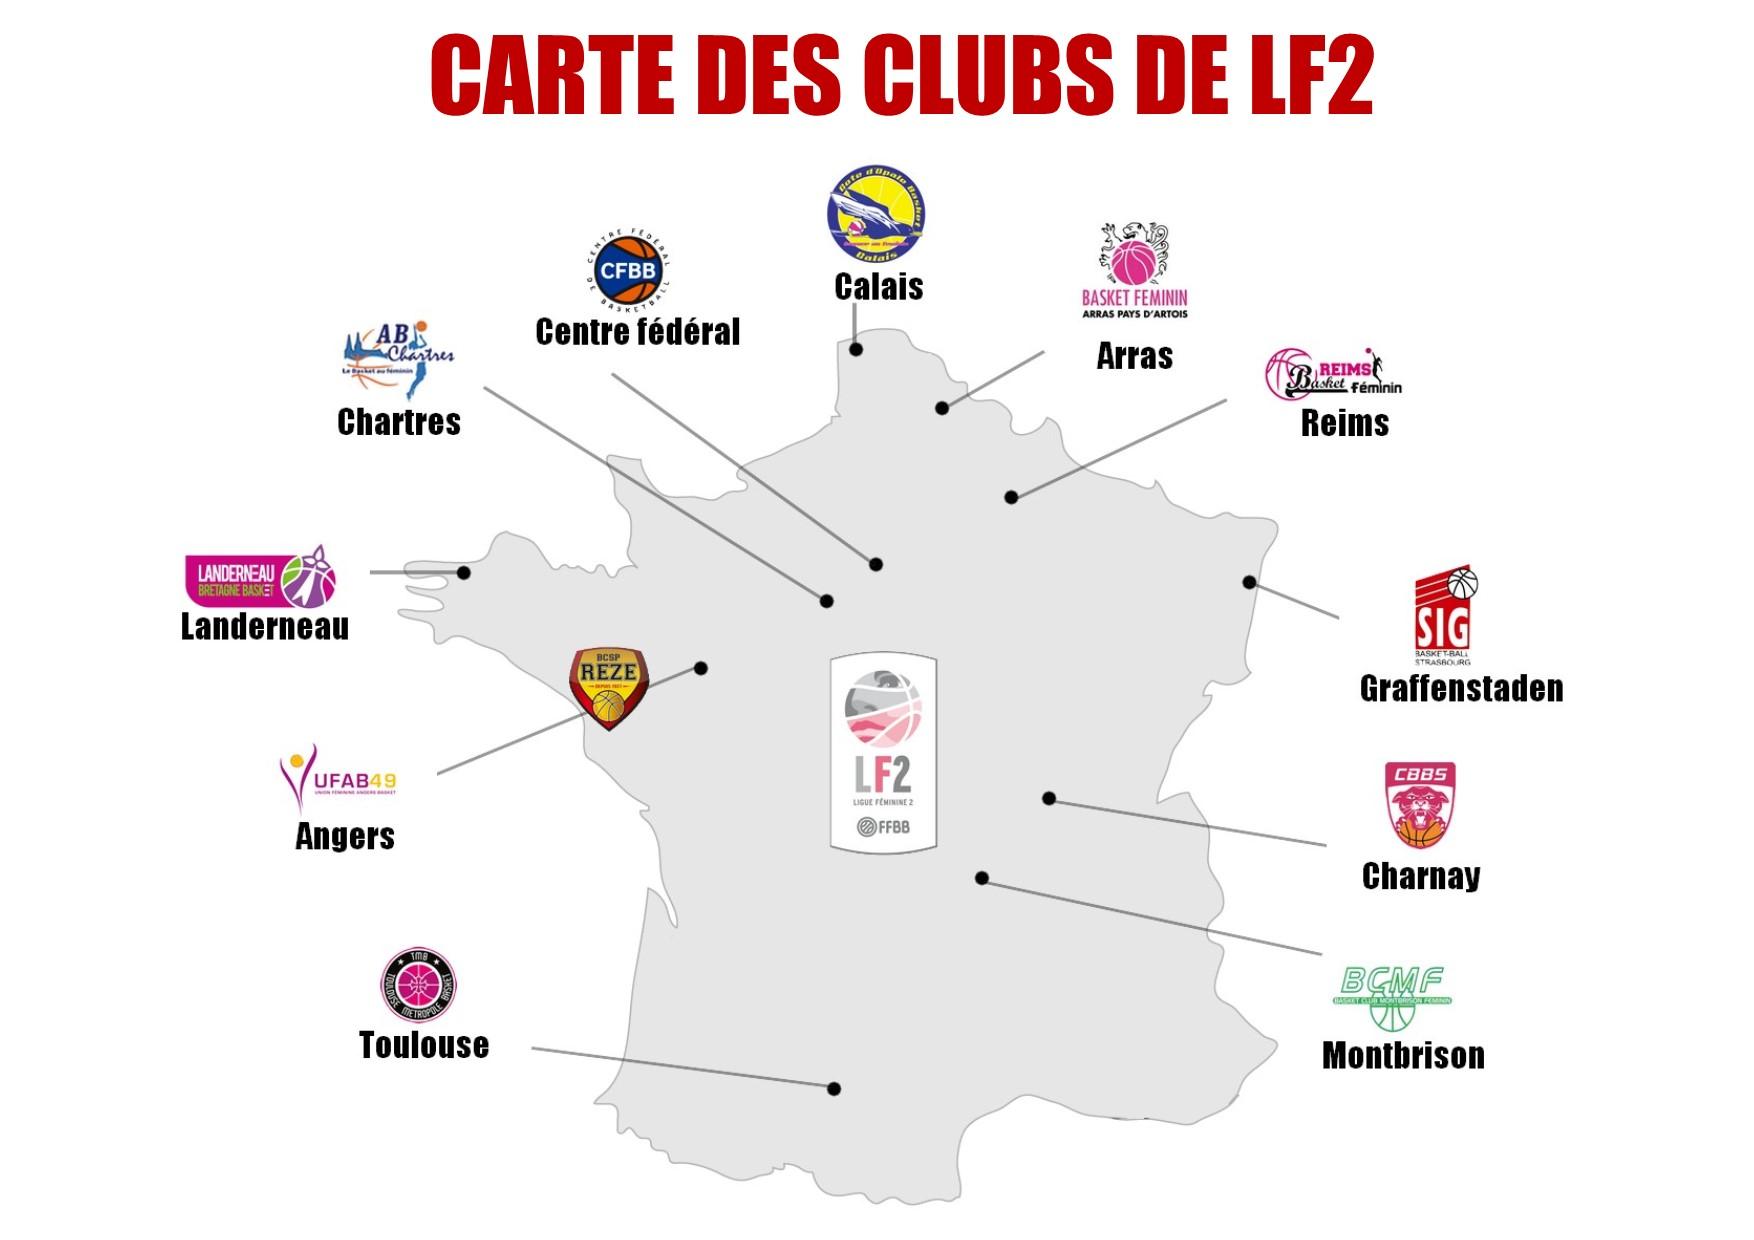 Carte-clubs-LF2-2017-2018